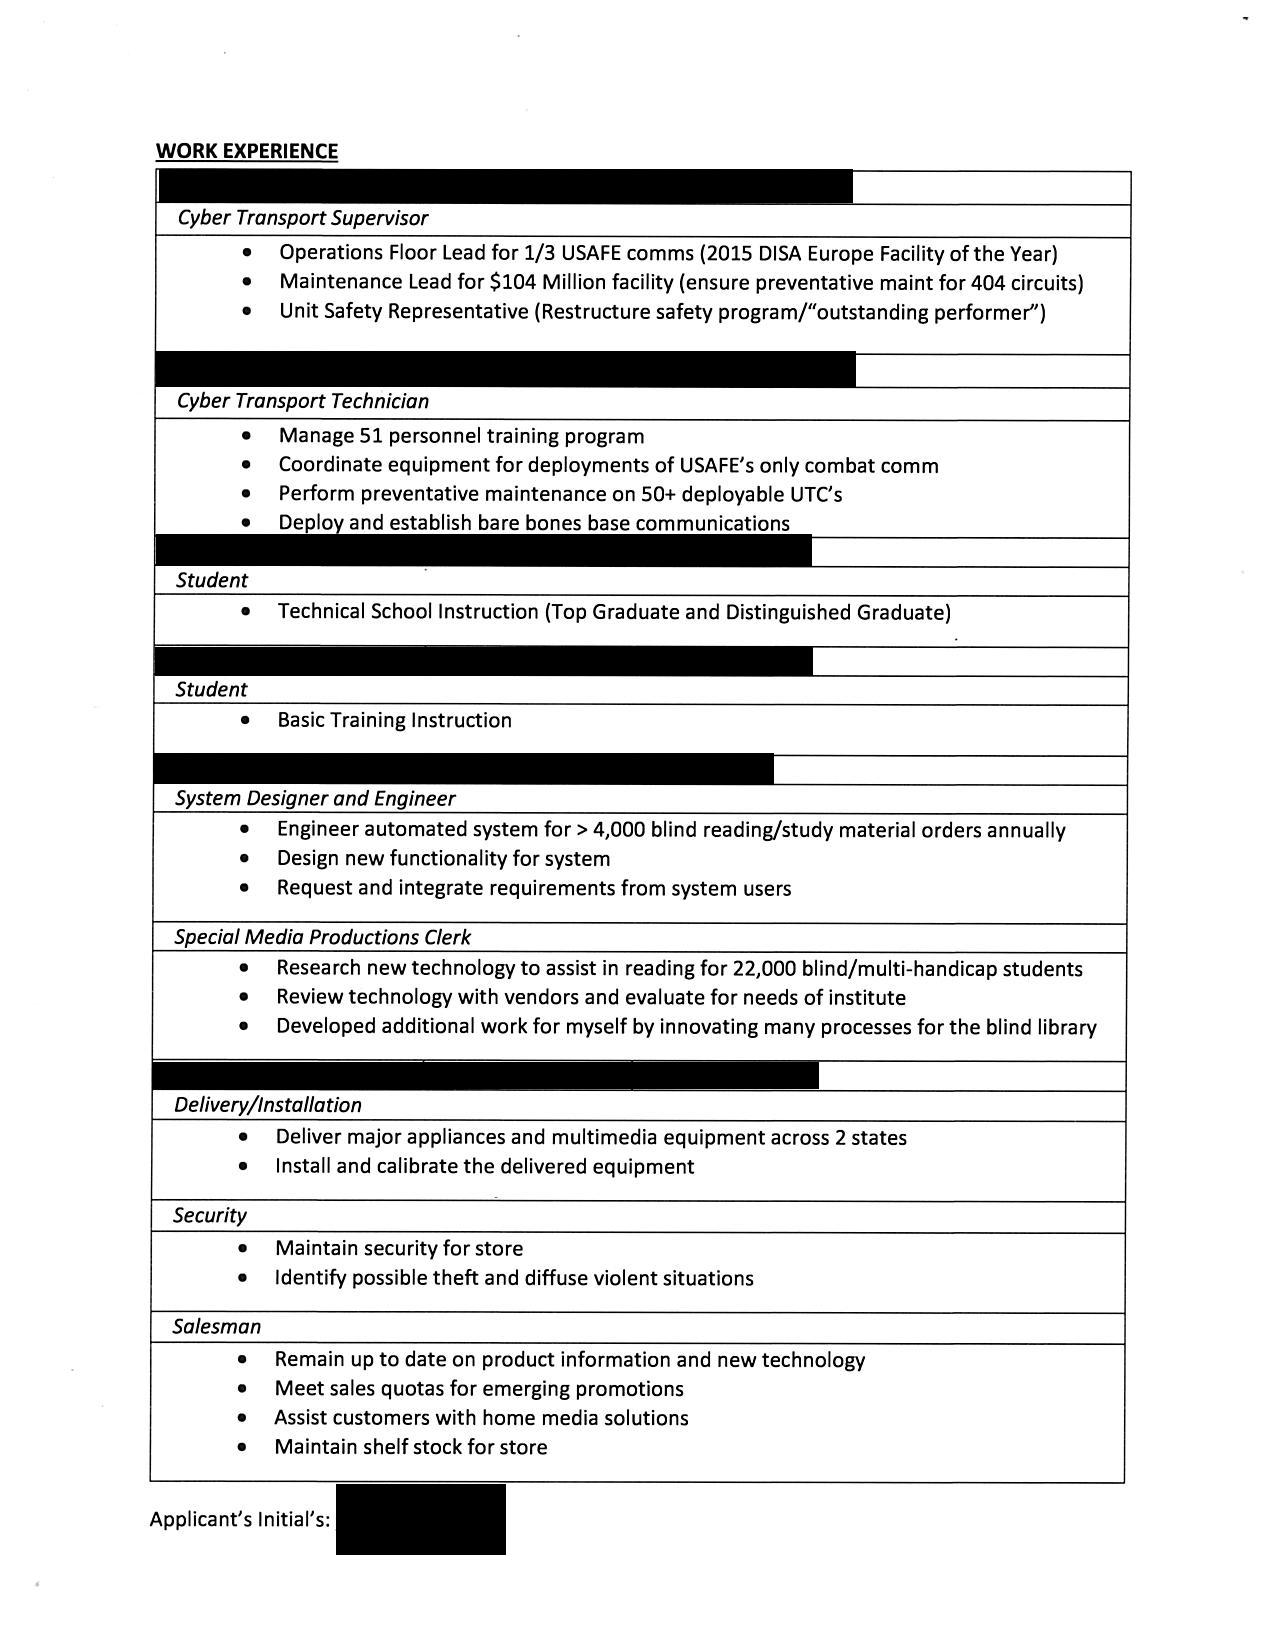 Thesis defense evaluation criteria picture 2